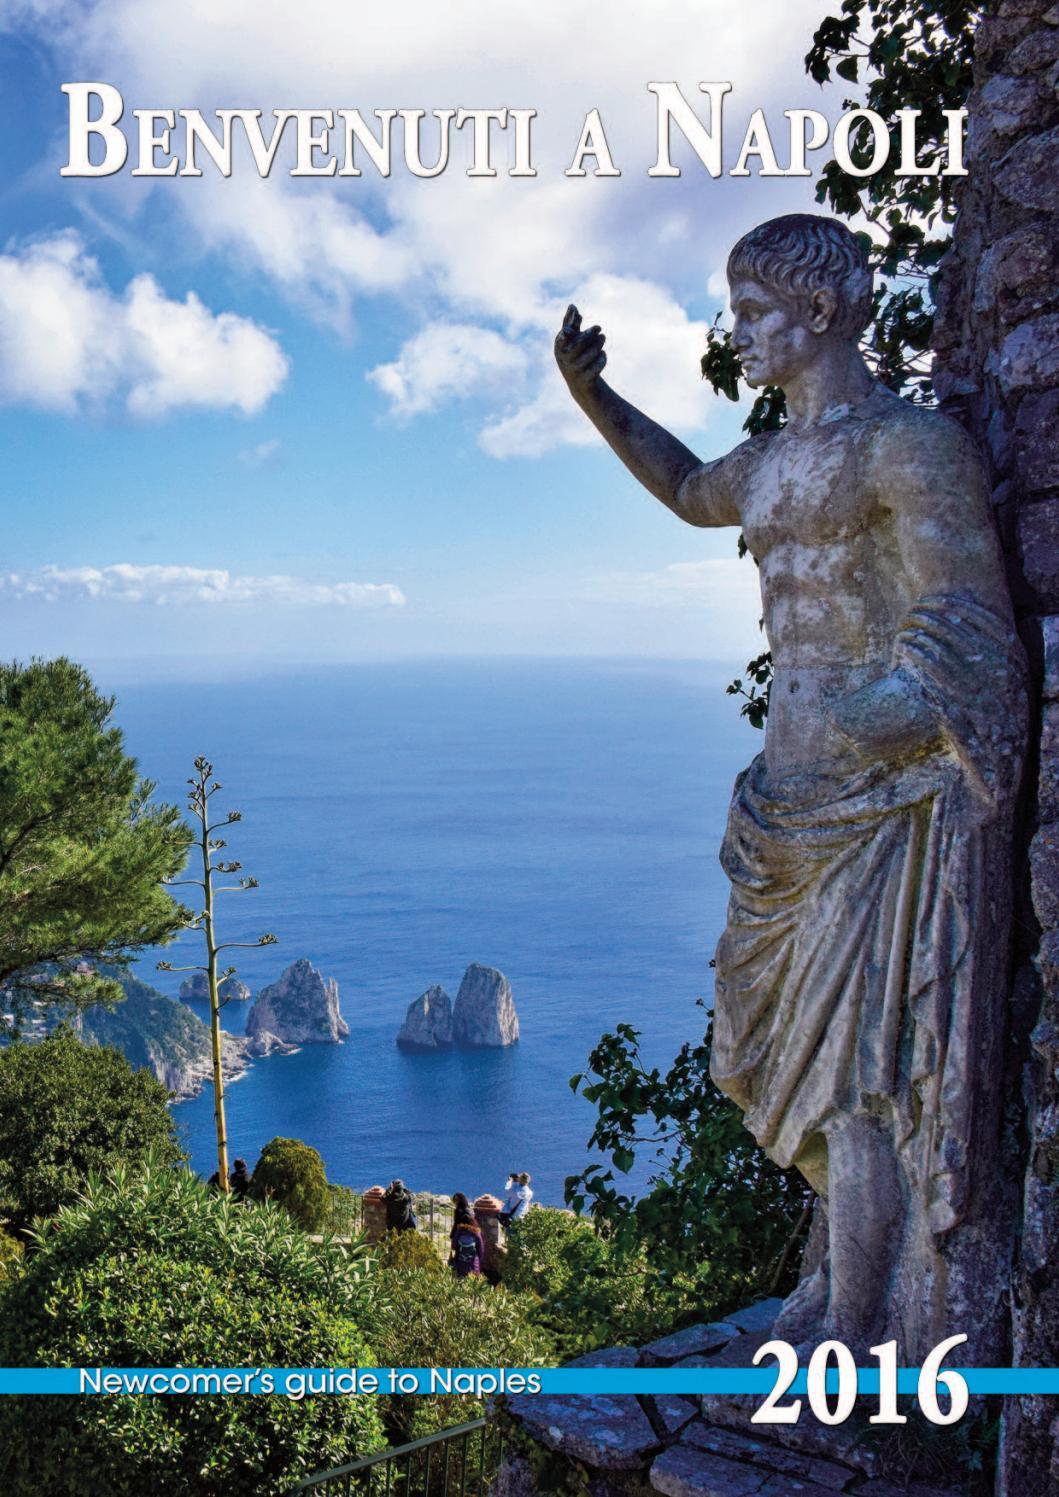 Benvenuti 2016 by NSA Naples - issuu 78266de229d3